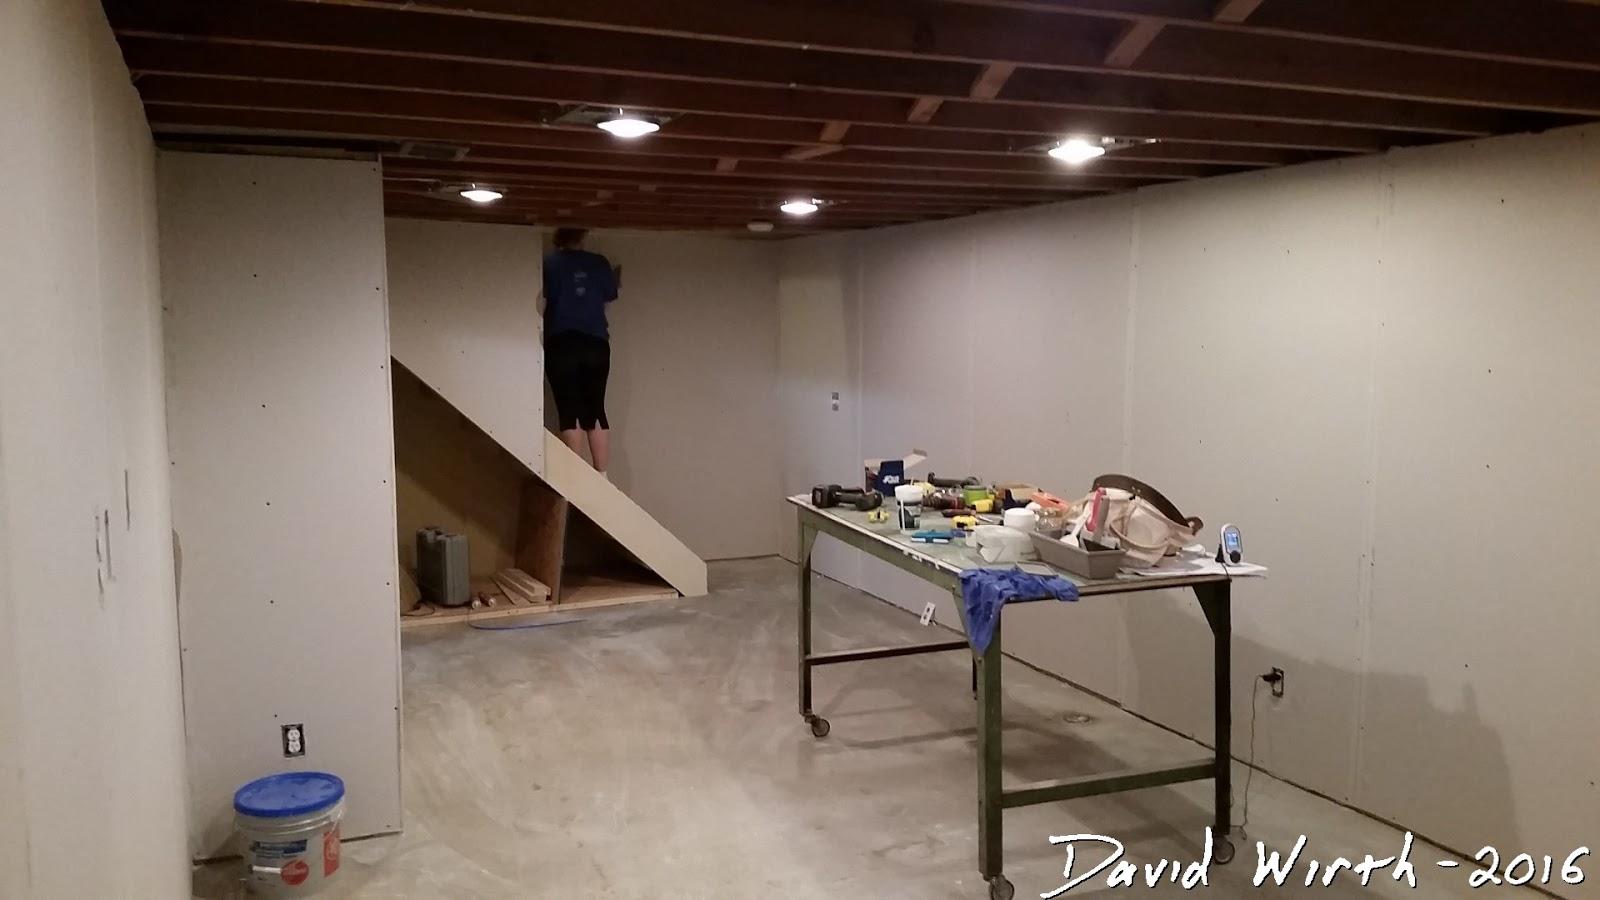 Elegant Images Of Finishing Basement Walls without Drywall ...